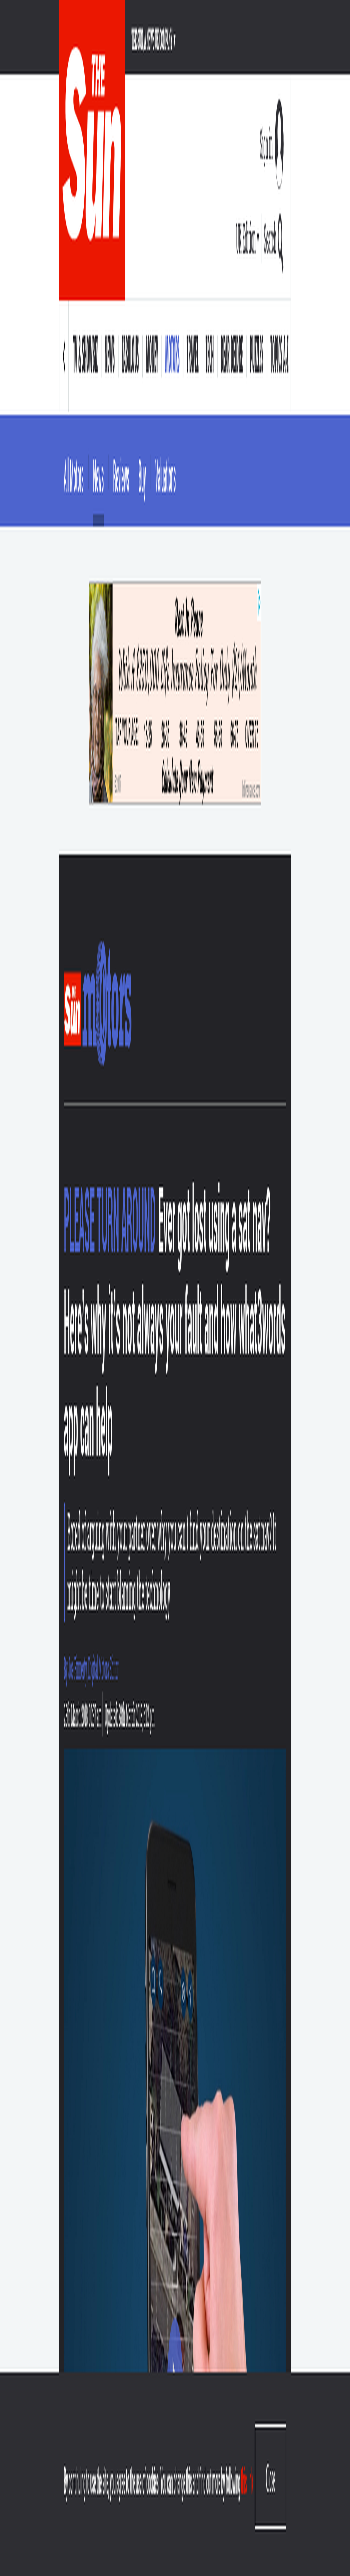 9f727db2 2ae0 4c63 b4d8 a058ee7b322f 53d96a33ae0f1c411f5023cfa00b2b5b7a092a98